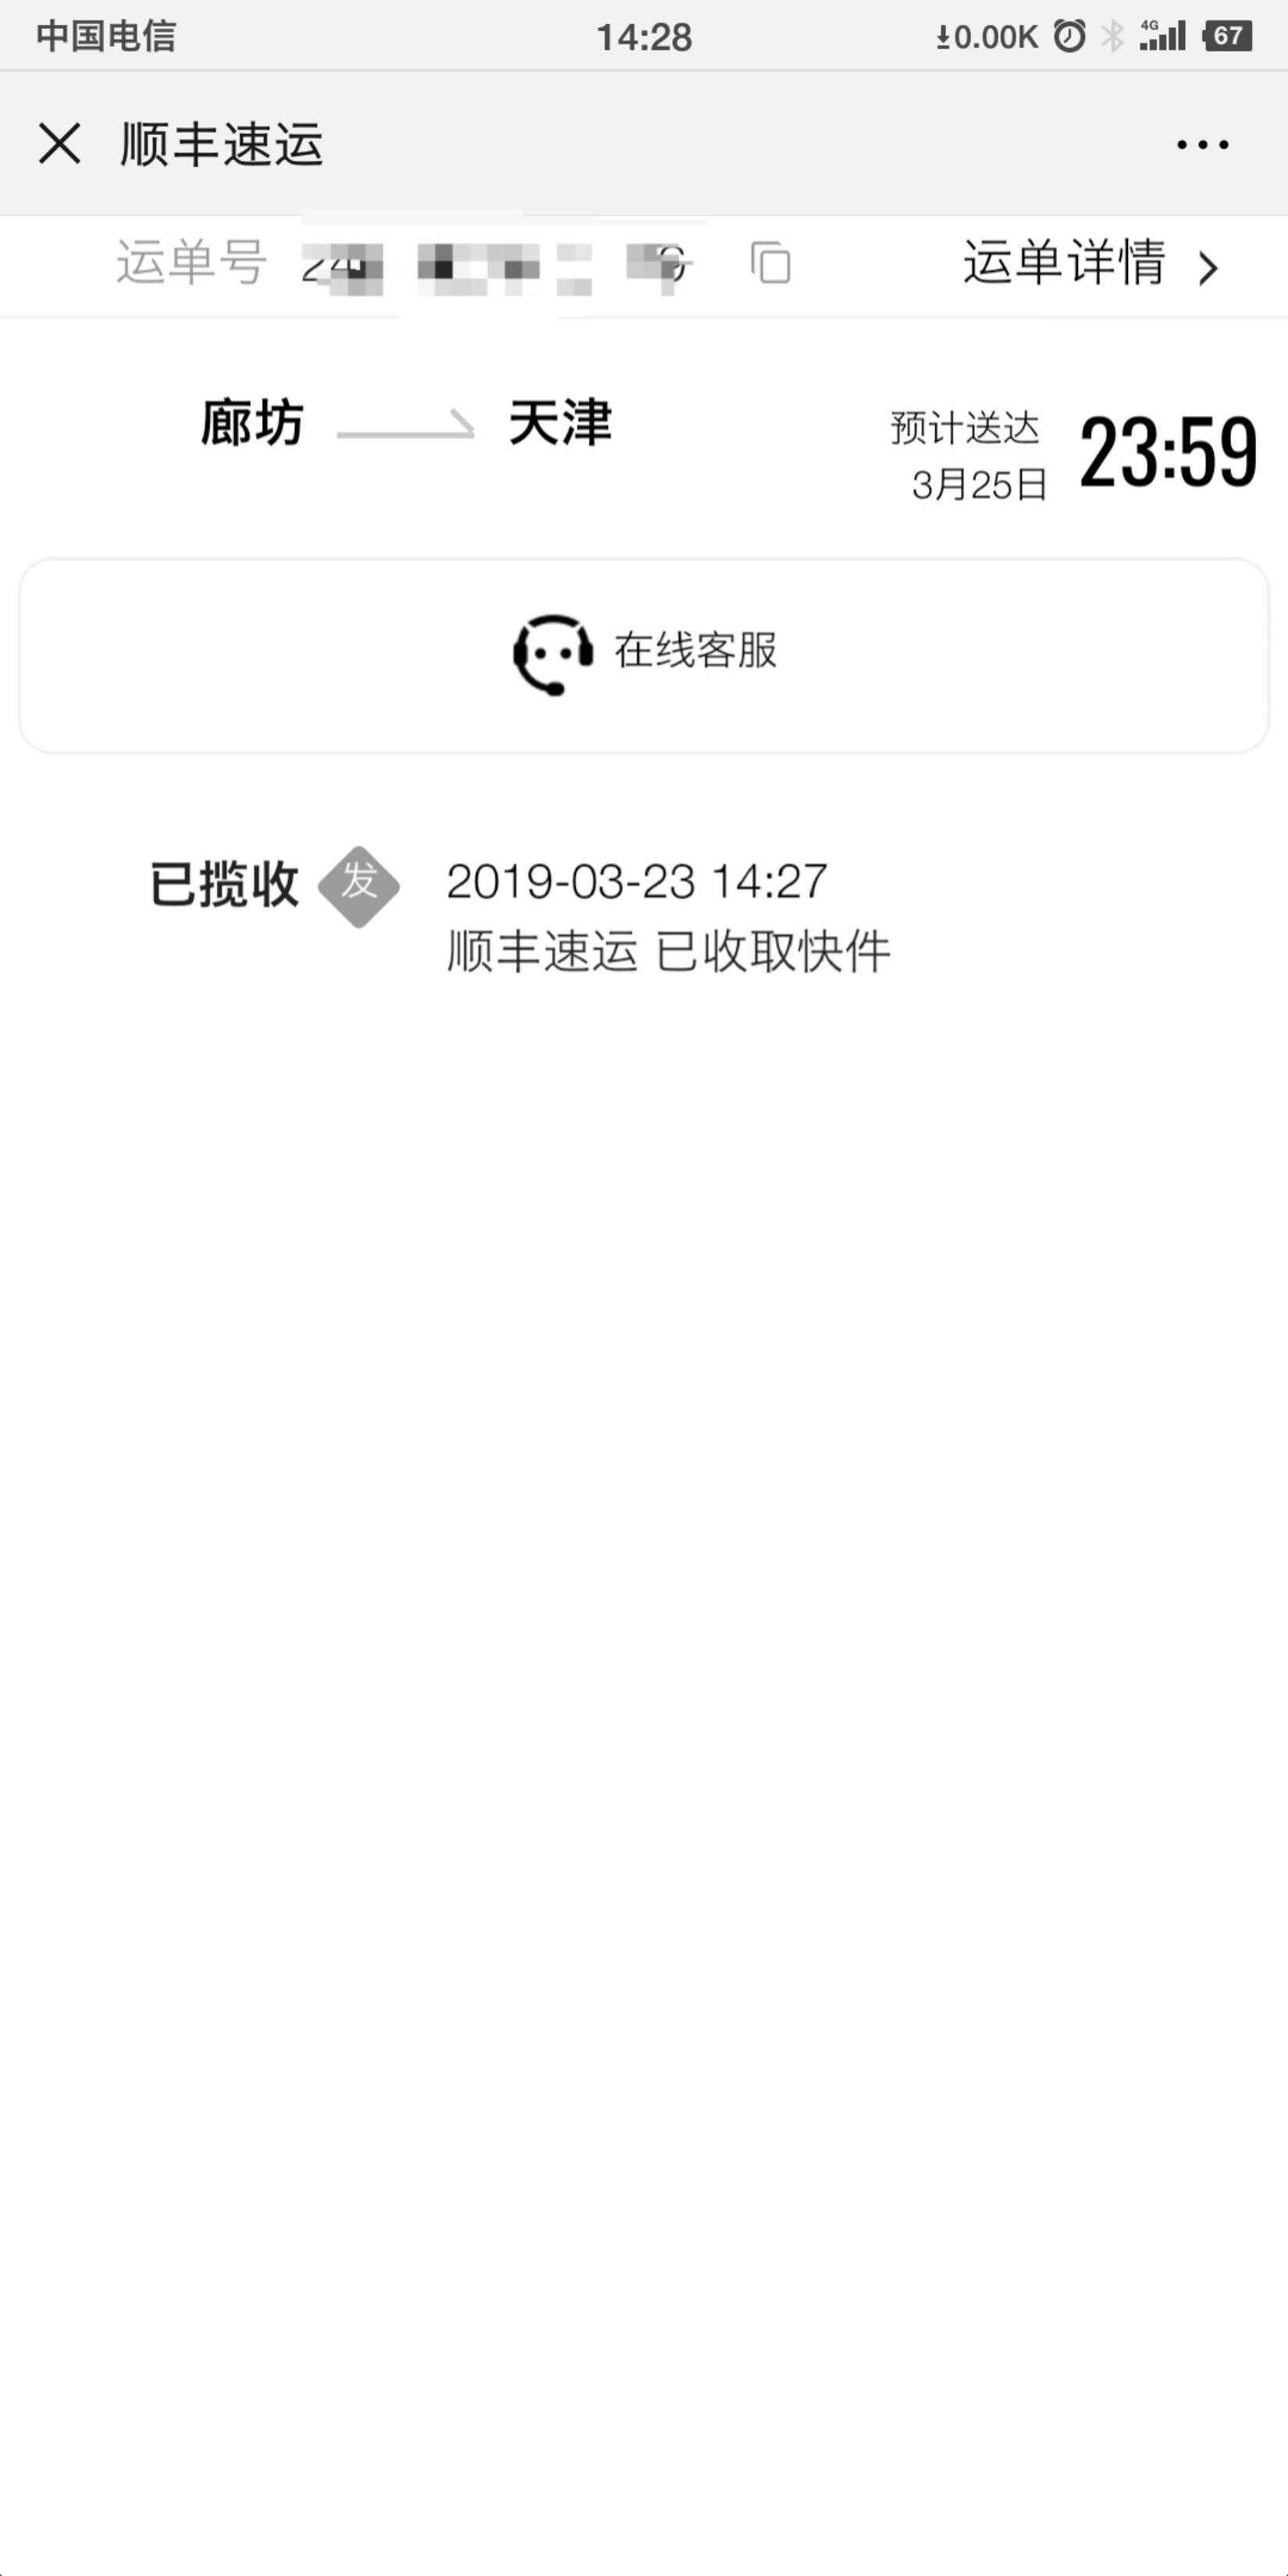 ??_Screenshot_2019-03-23-14-28-20-204_??.png